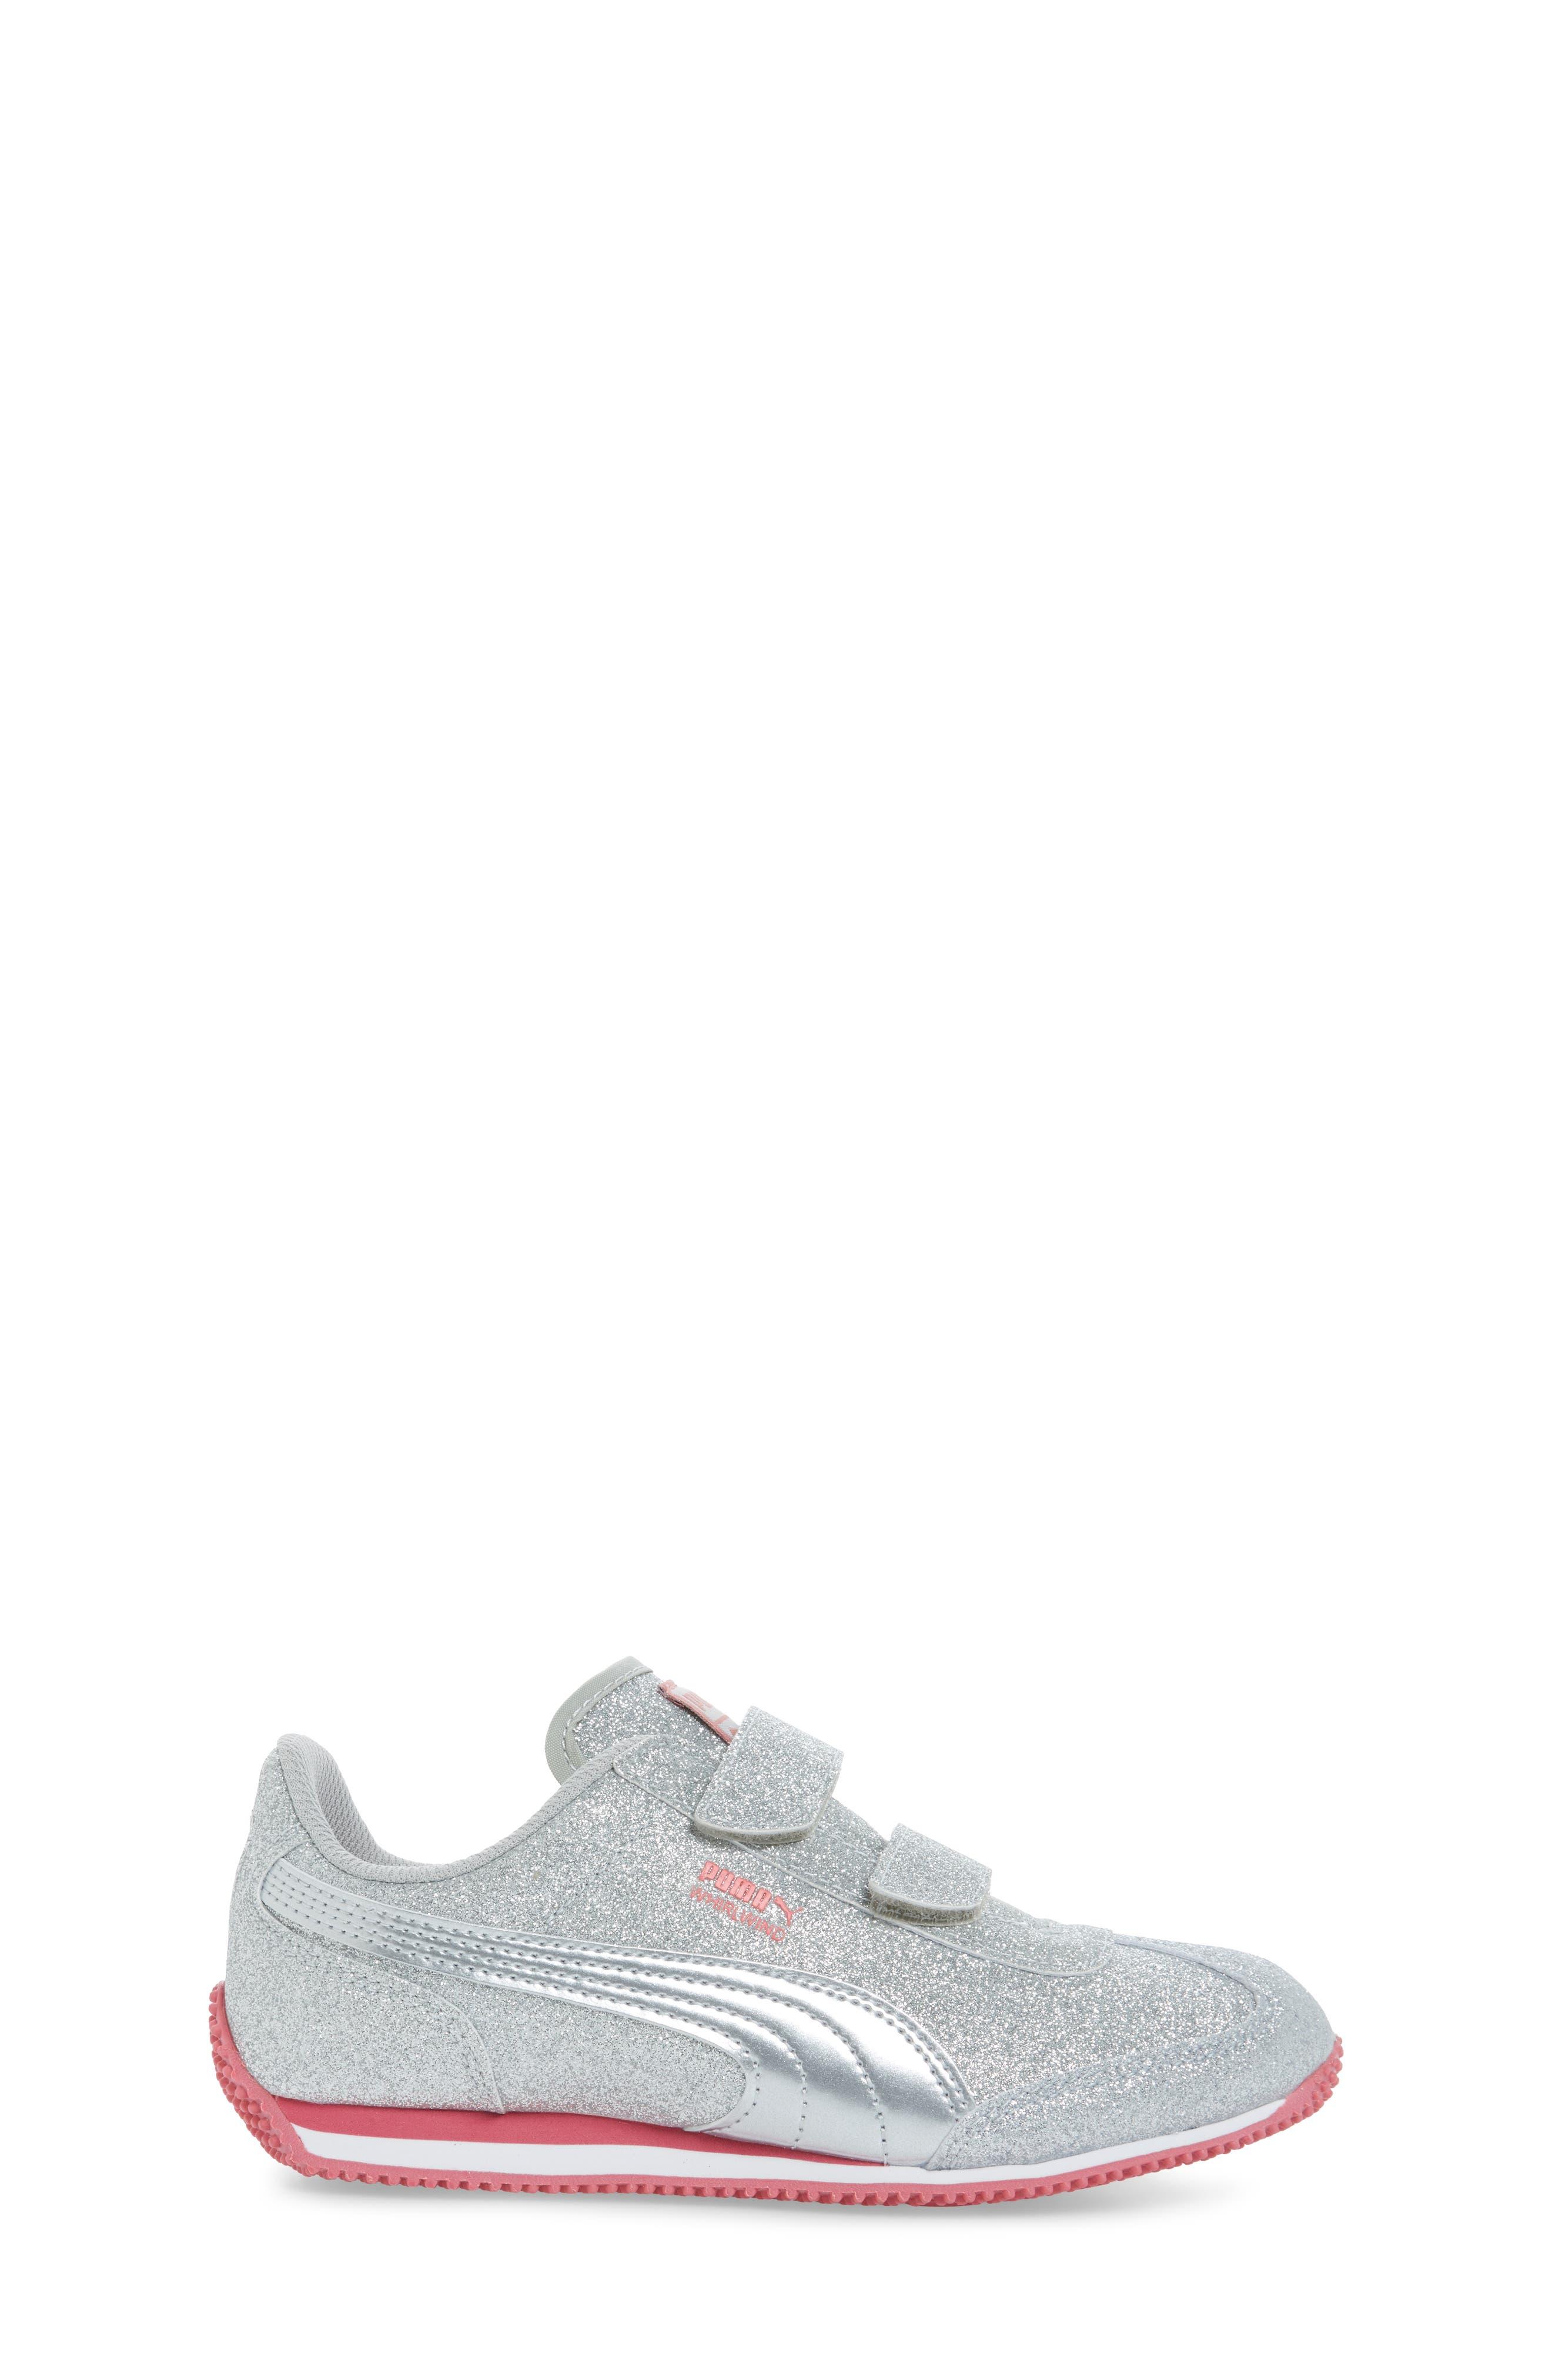 Whirlwind Glitz Sneaker,                             Alternate thumbnail 3, color,                             040